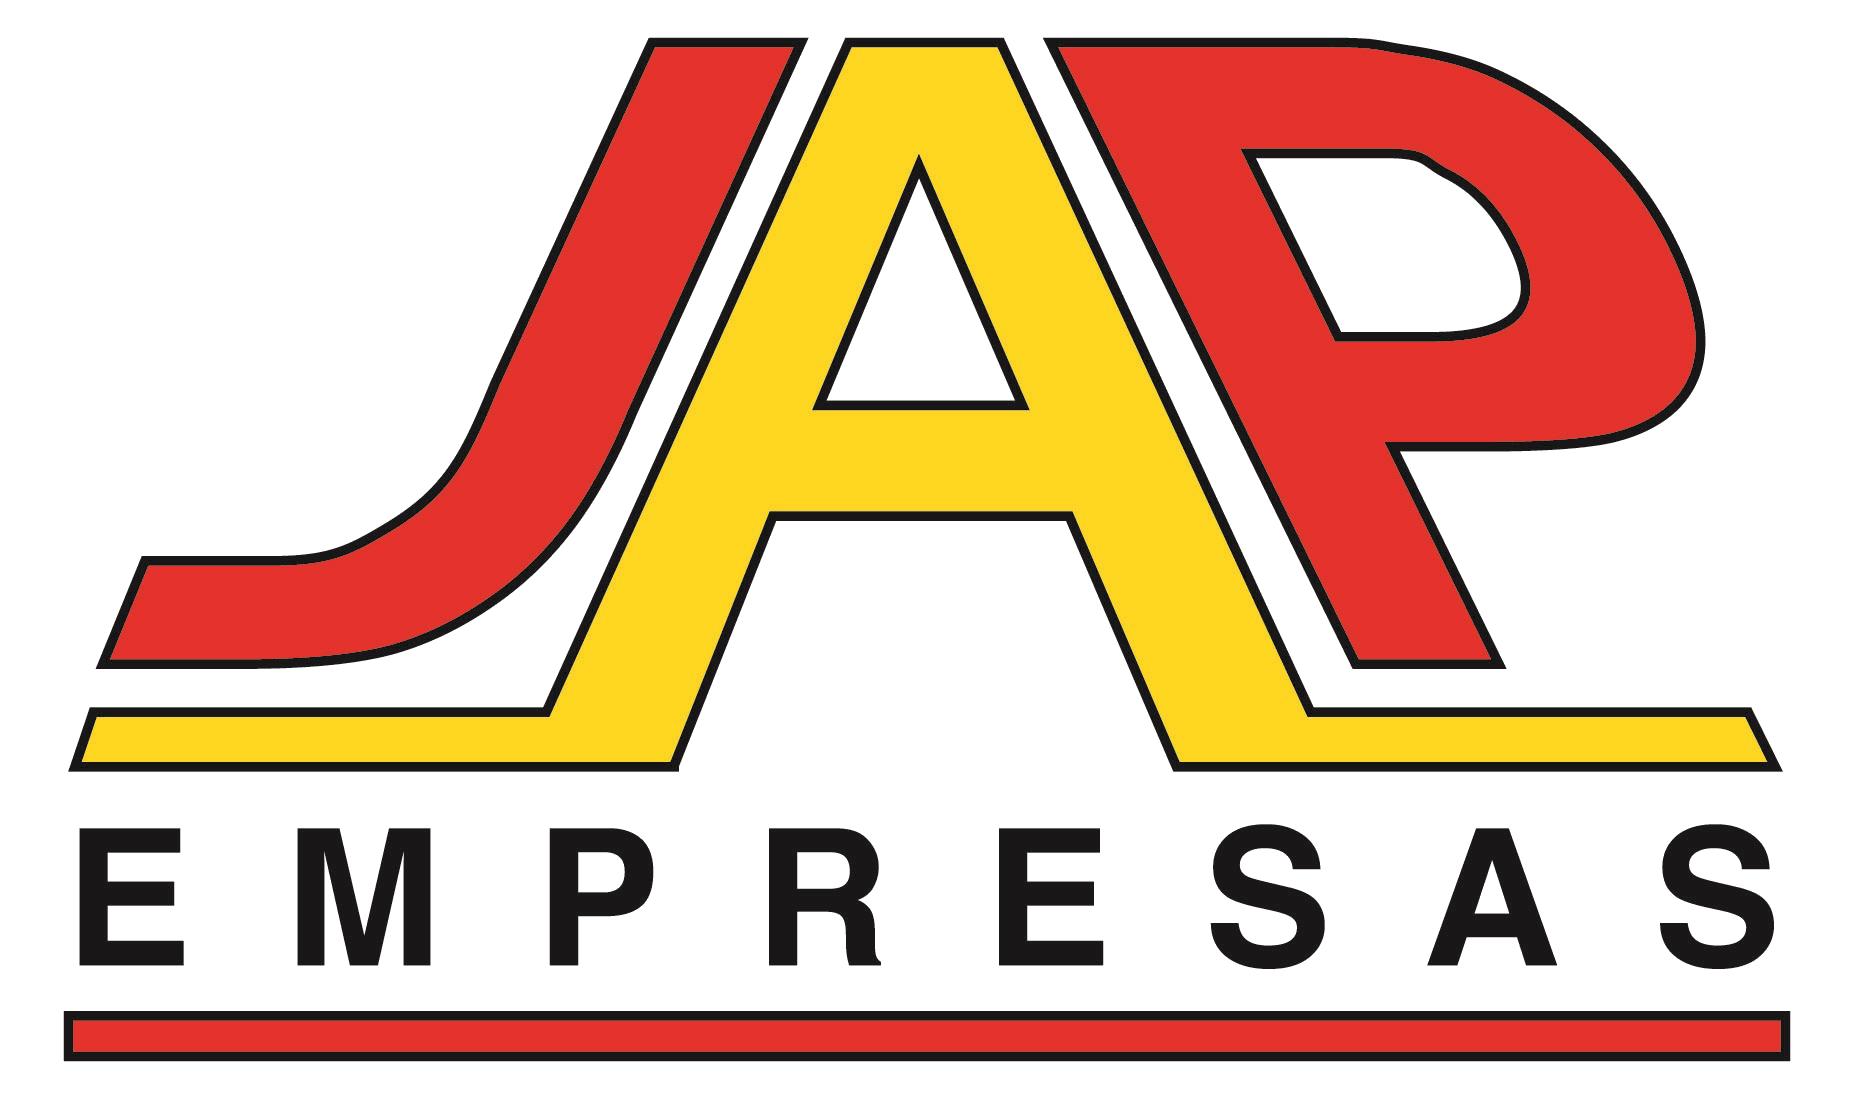 JAP EMPRESAS